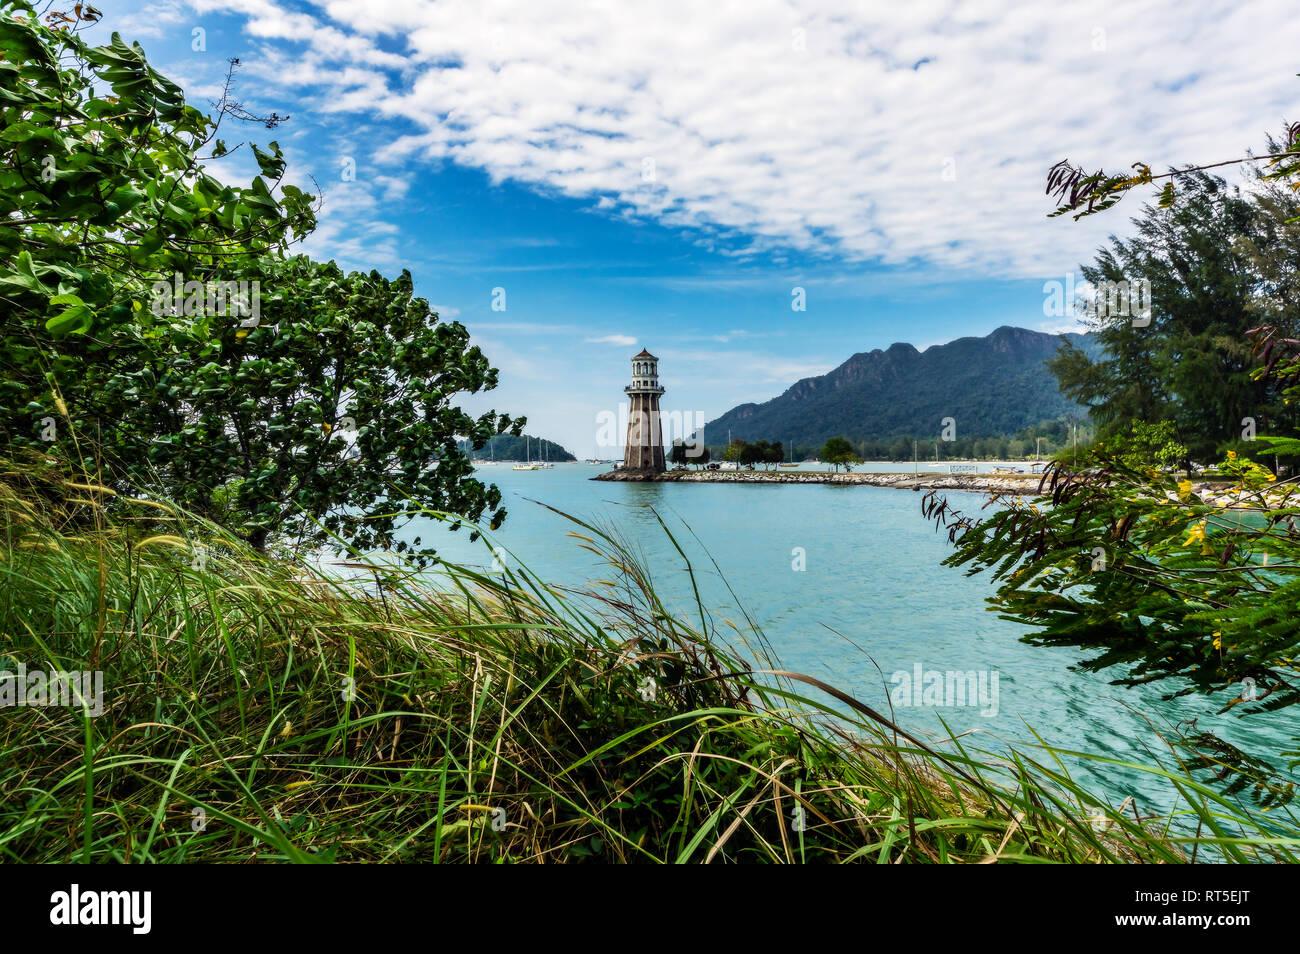 Malaysia, Langkawi, Light House Stockbild